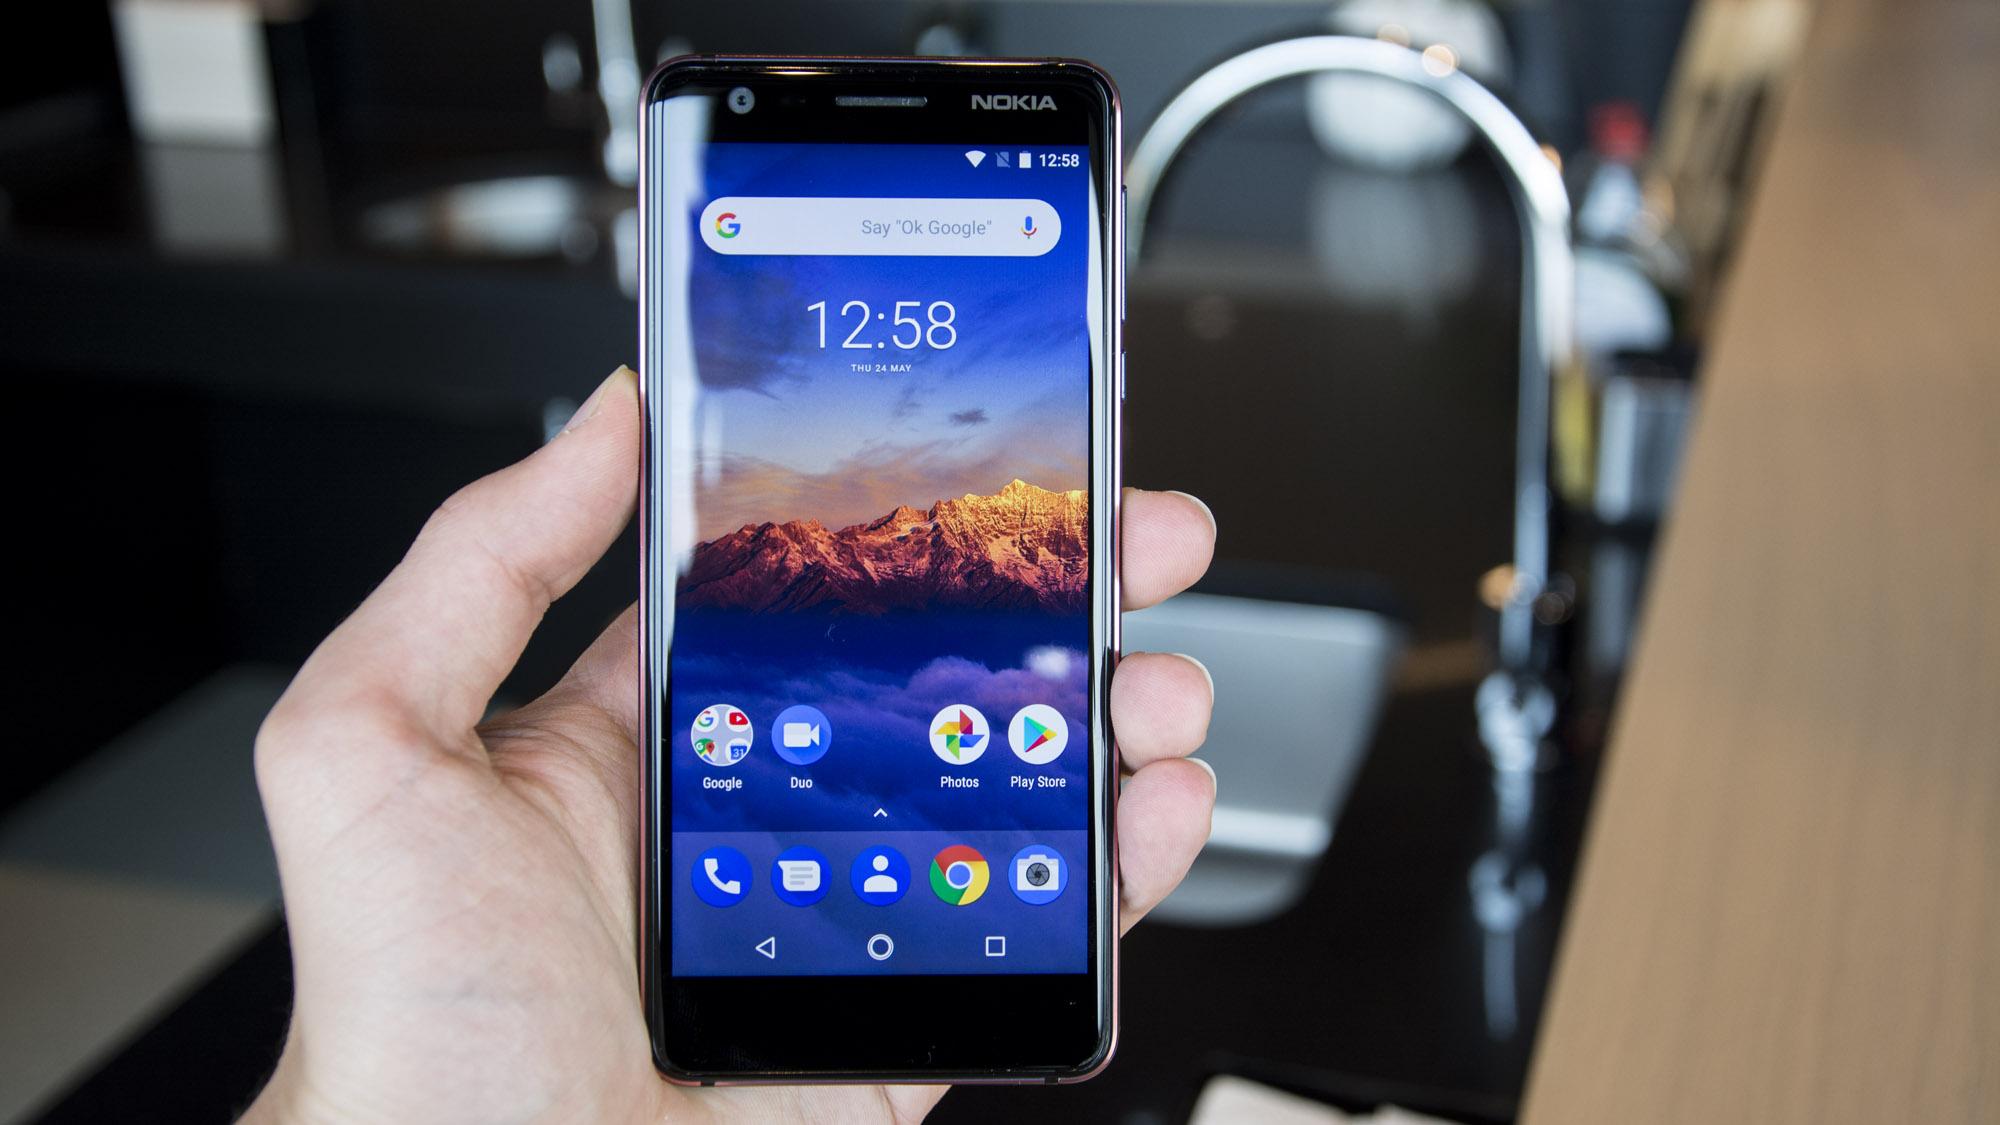 Nokia 3.1 plus Android One